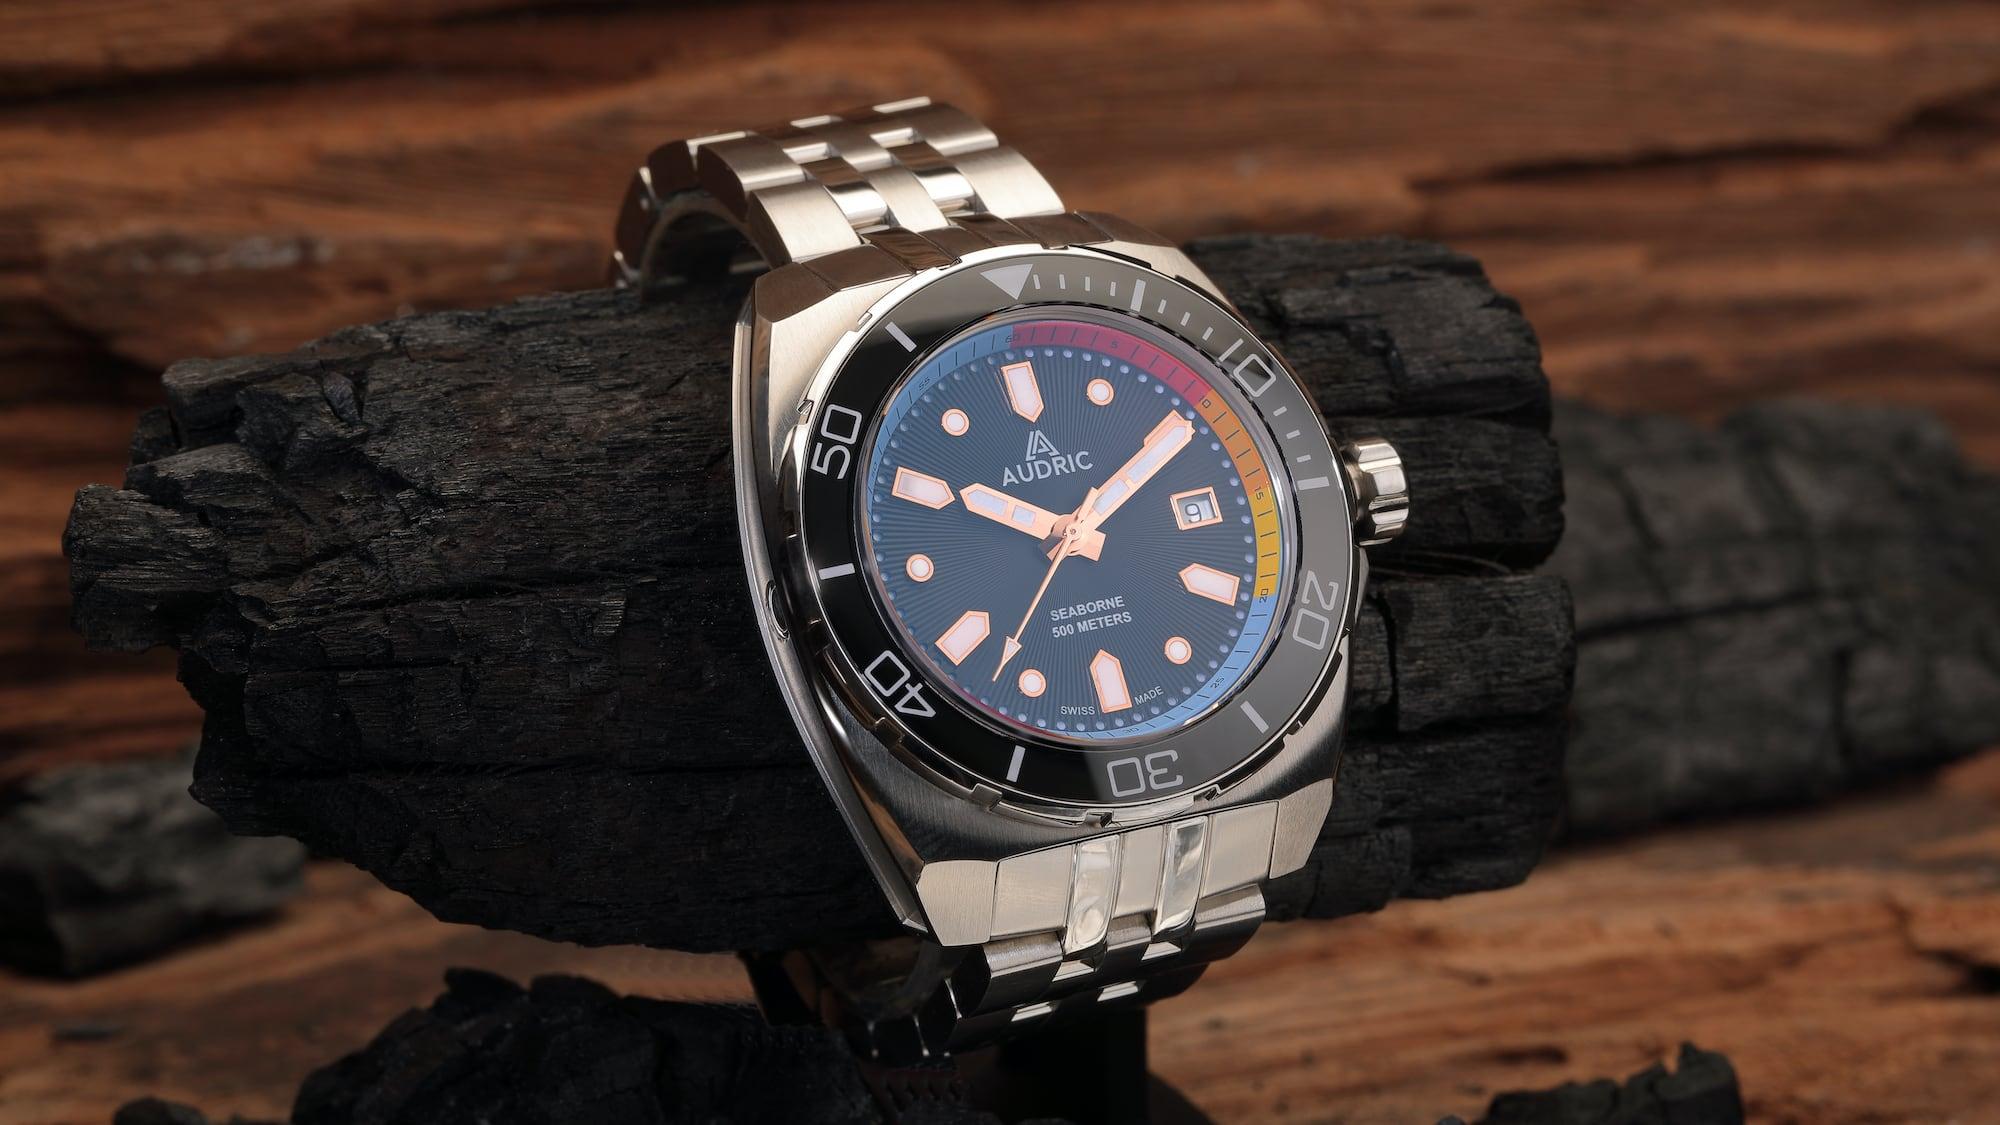 AUDRIC SeaBorne 500 M Rugged Tool Watch